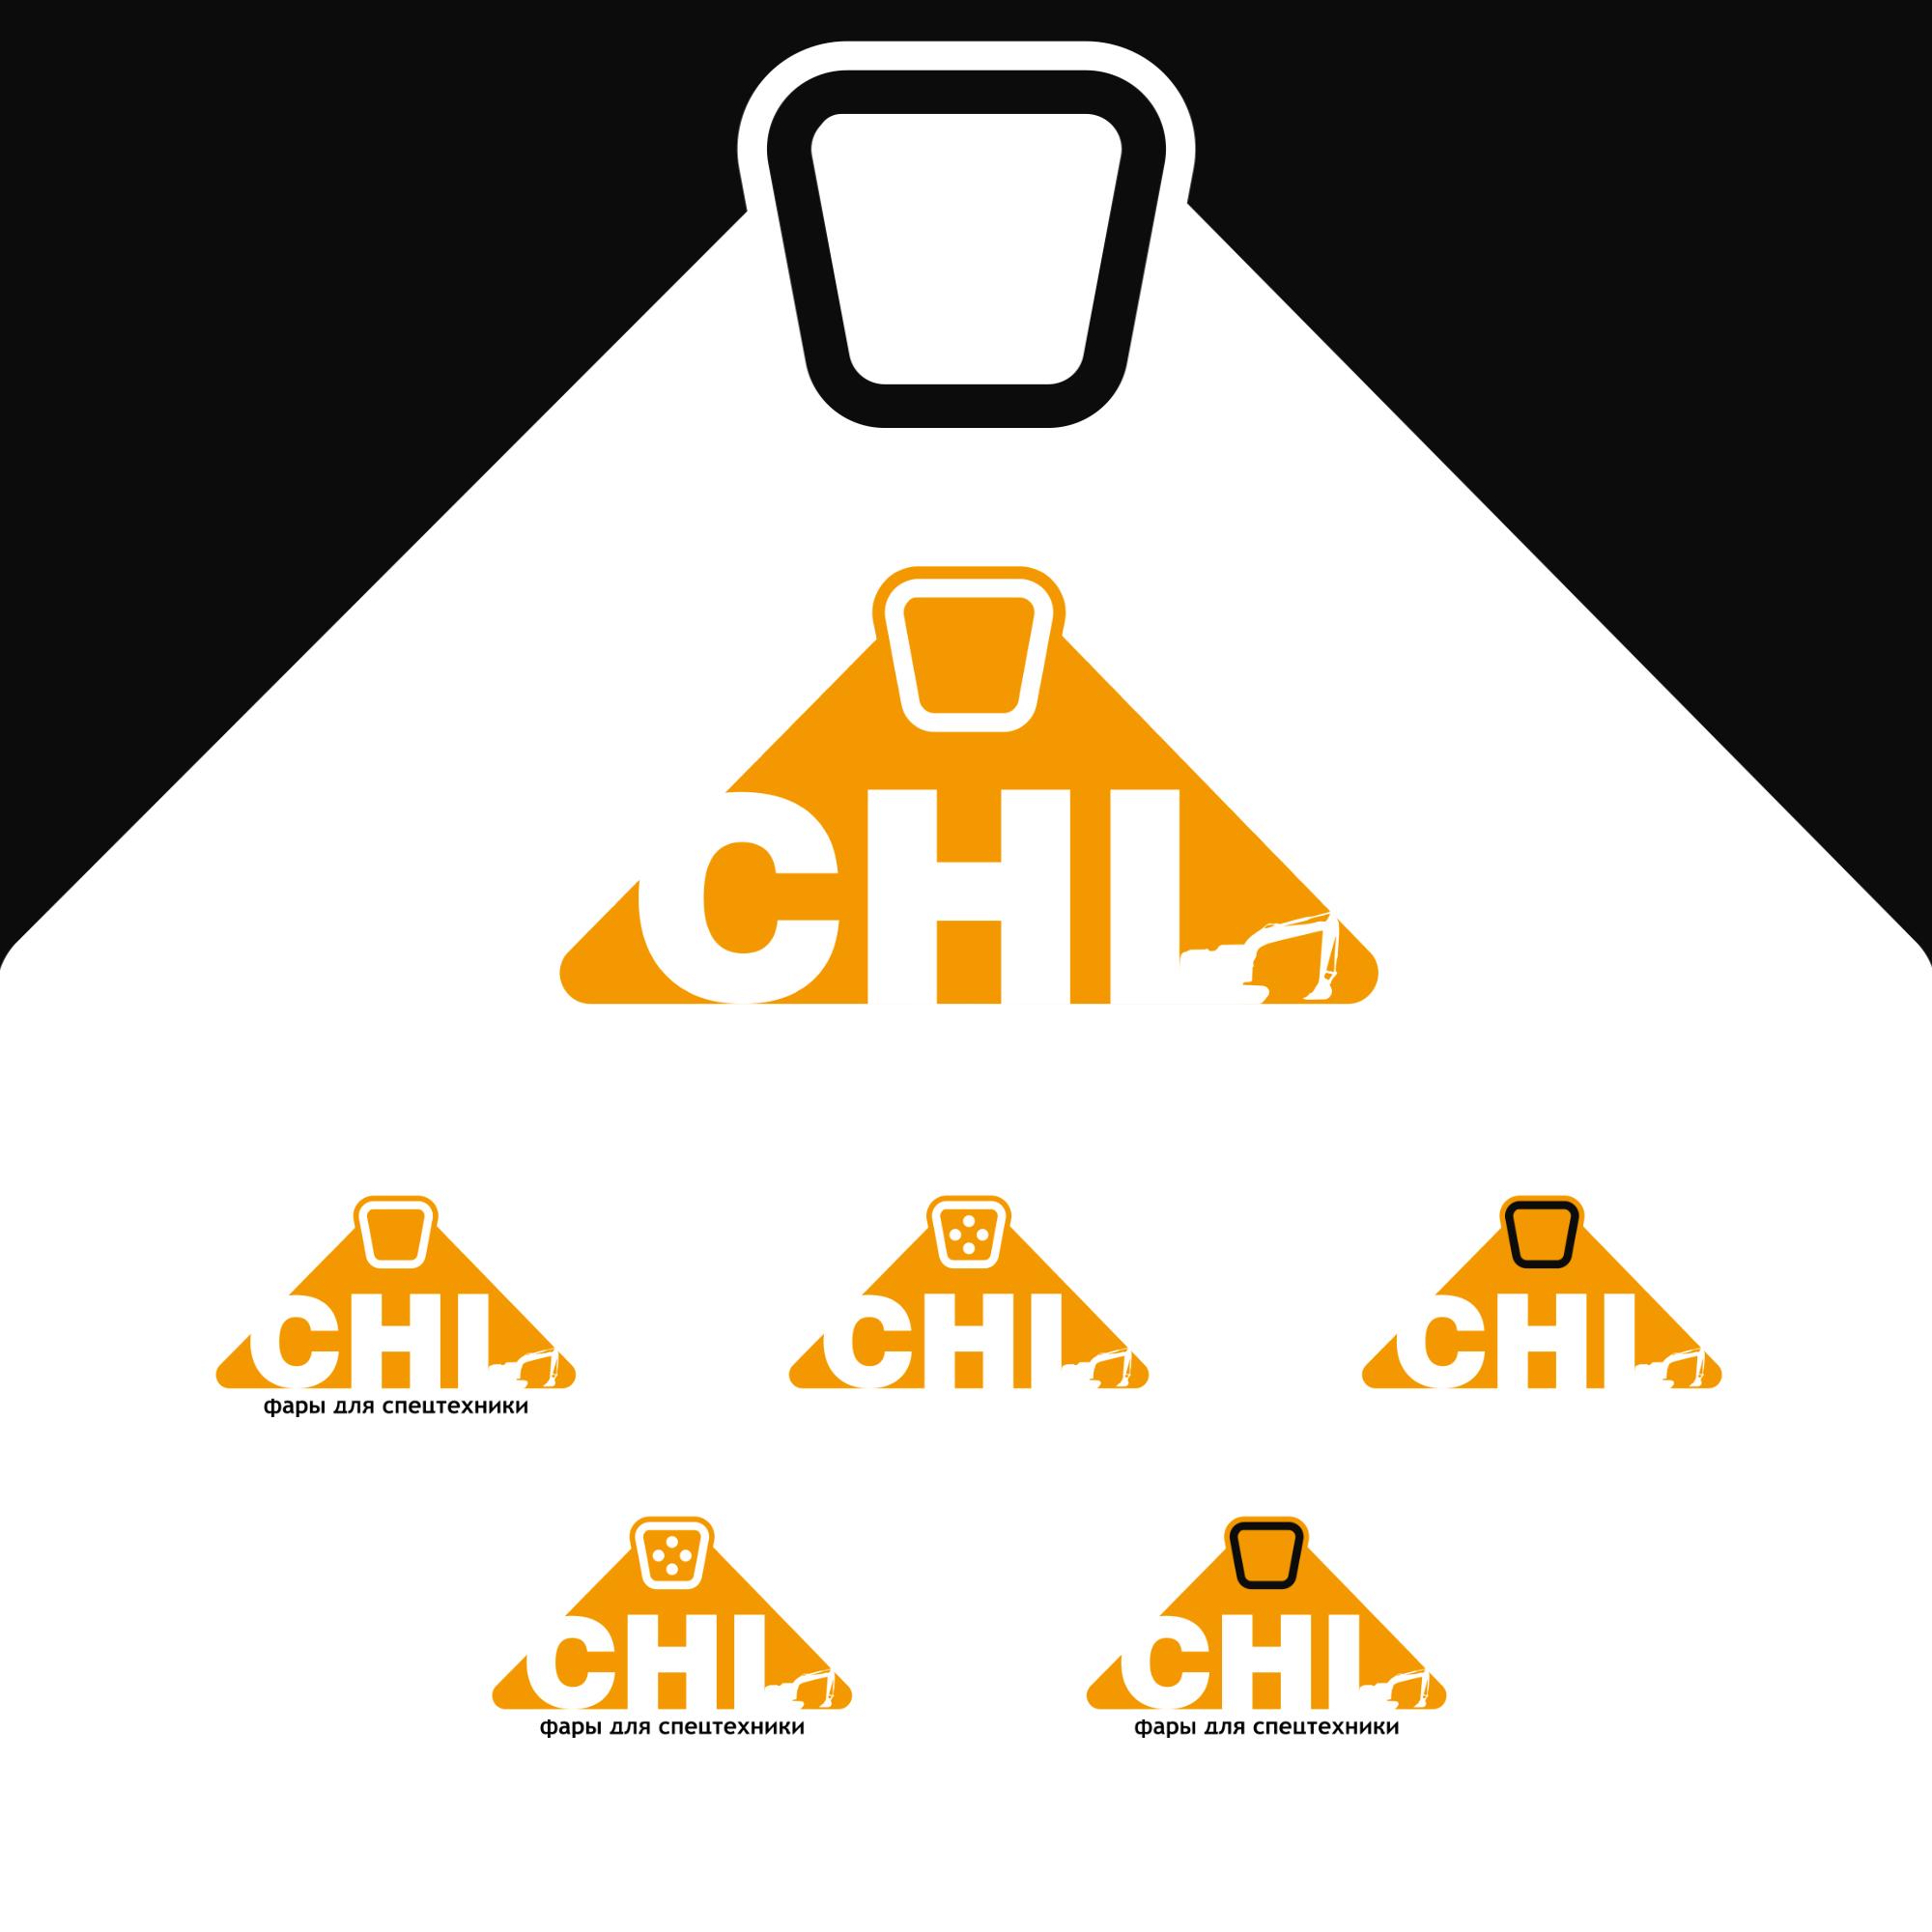 разработка логотипа для производителя фар фото f_1415f5da18080179.jpg